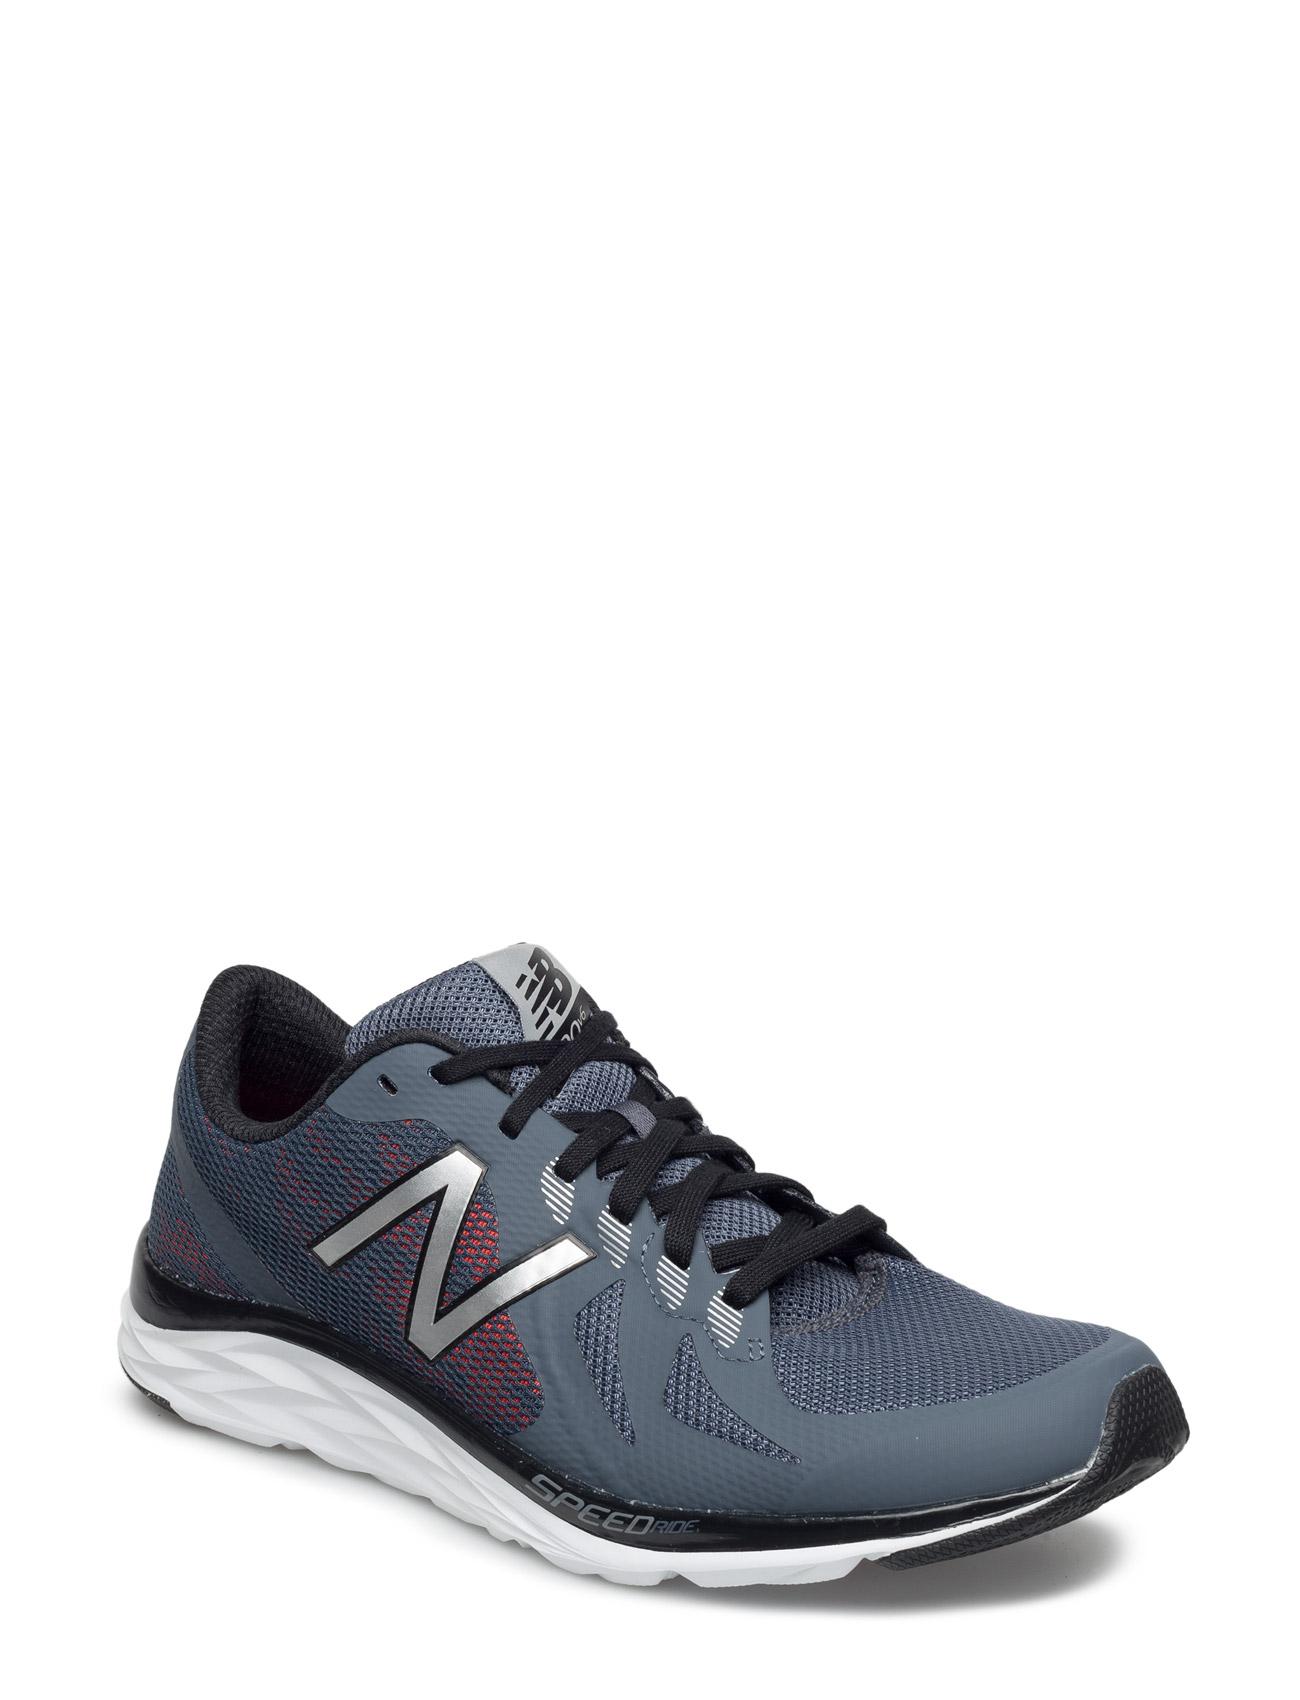 M790lg6 New Balance Sports sko til Mænd i Grå